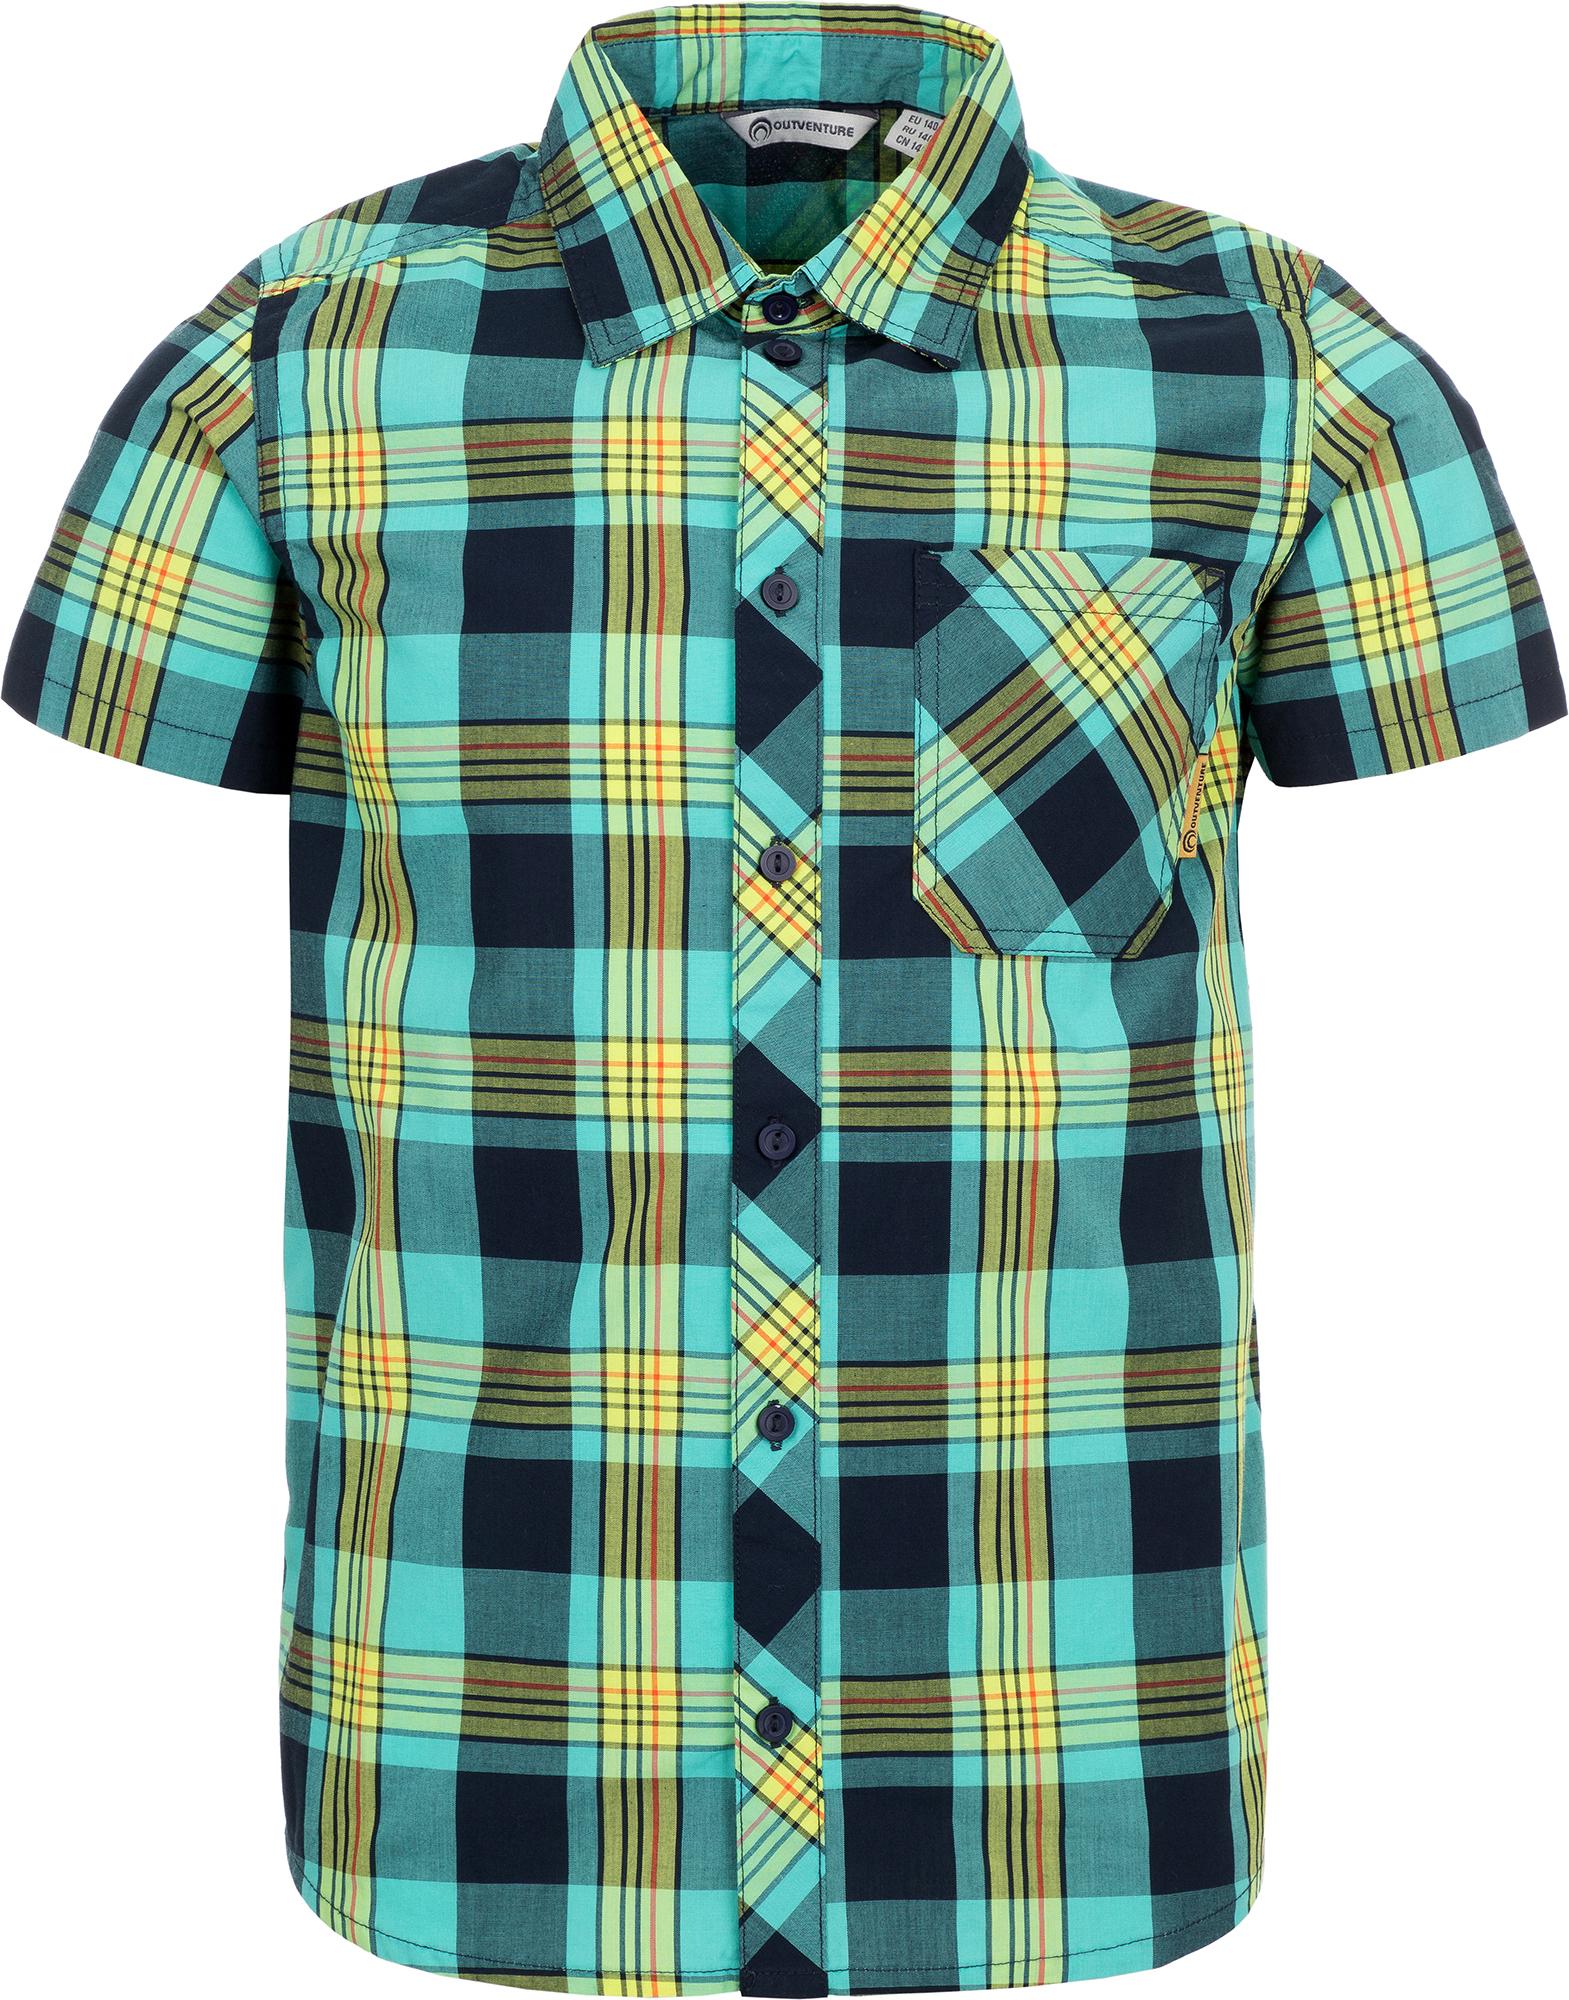 Outventure Рубашка с коротким рукавом для мальчиков Outventure, размер 128